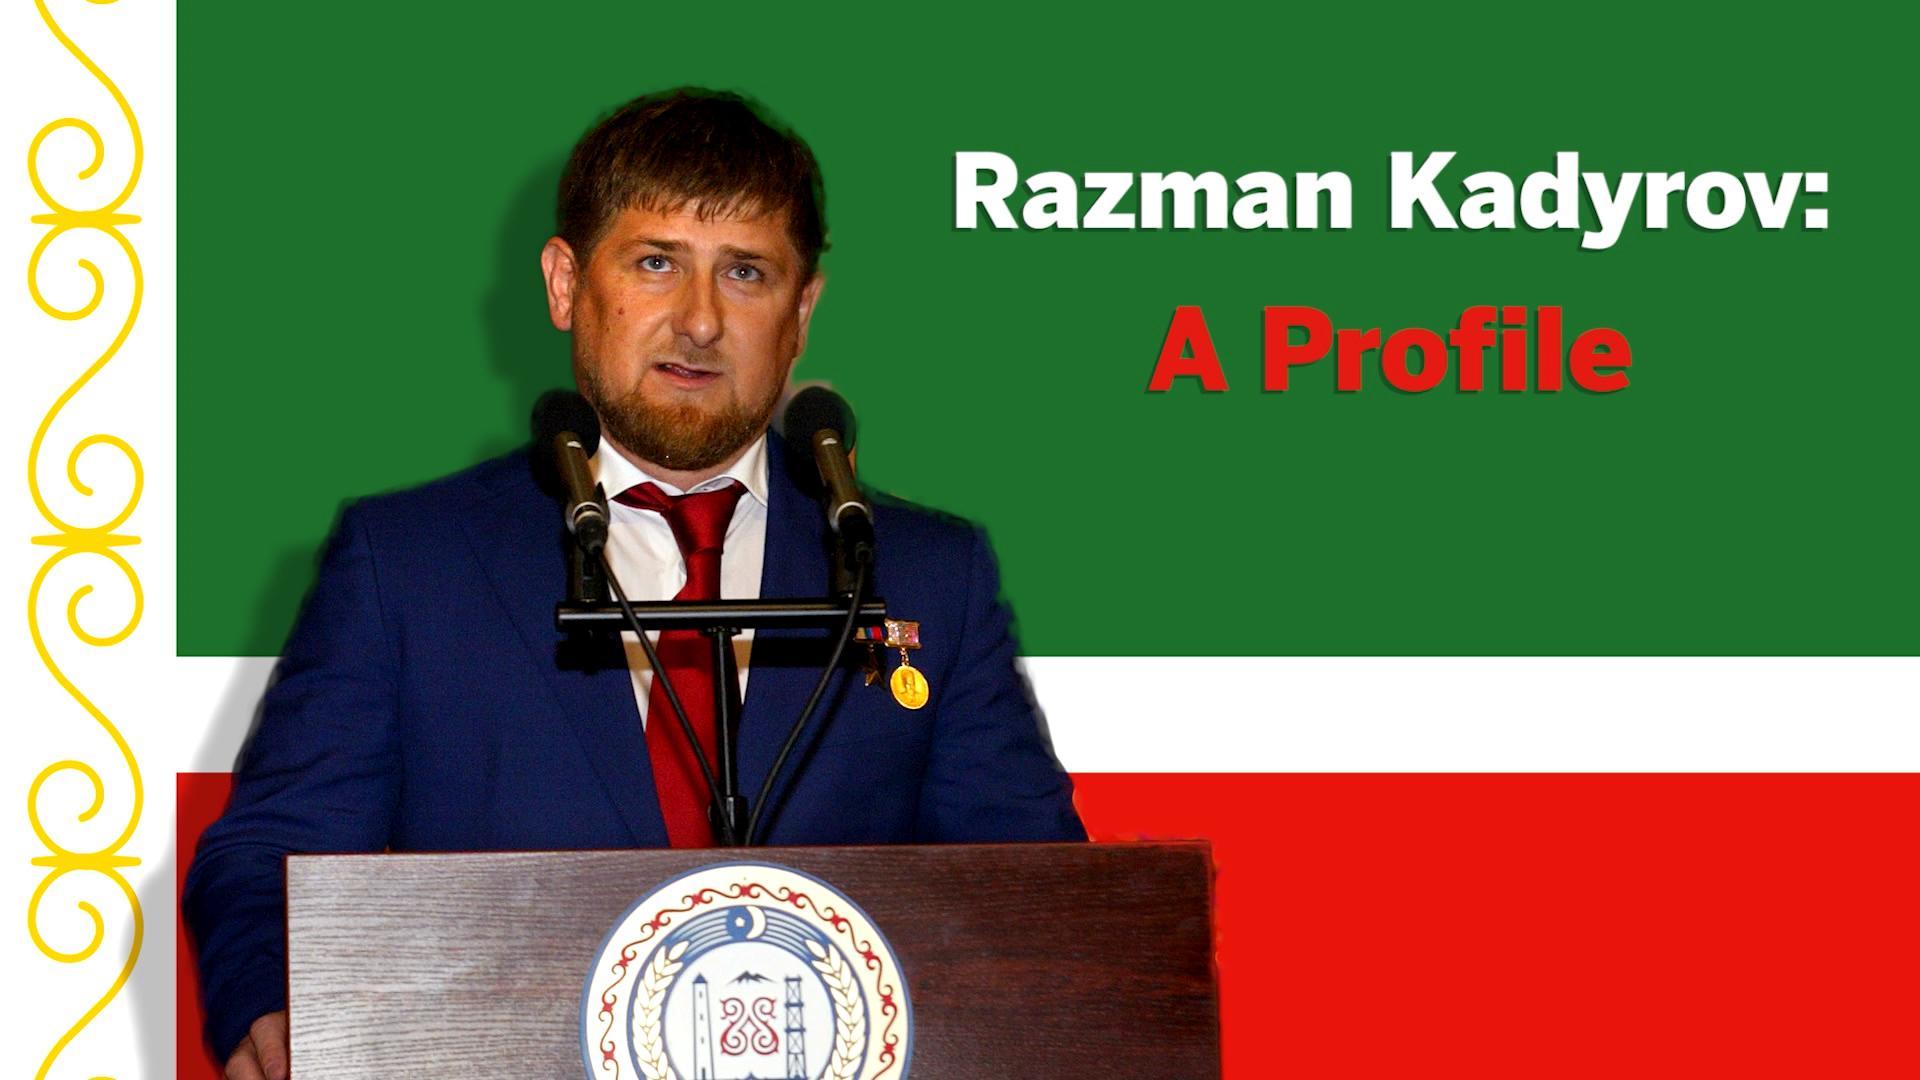 Razman Kadyrov: A Profile